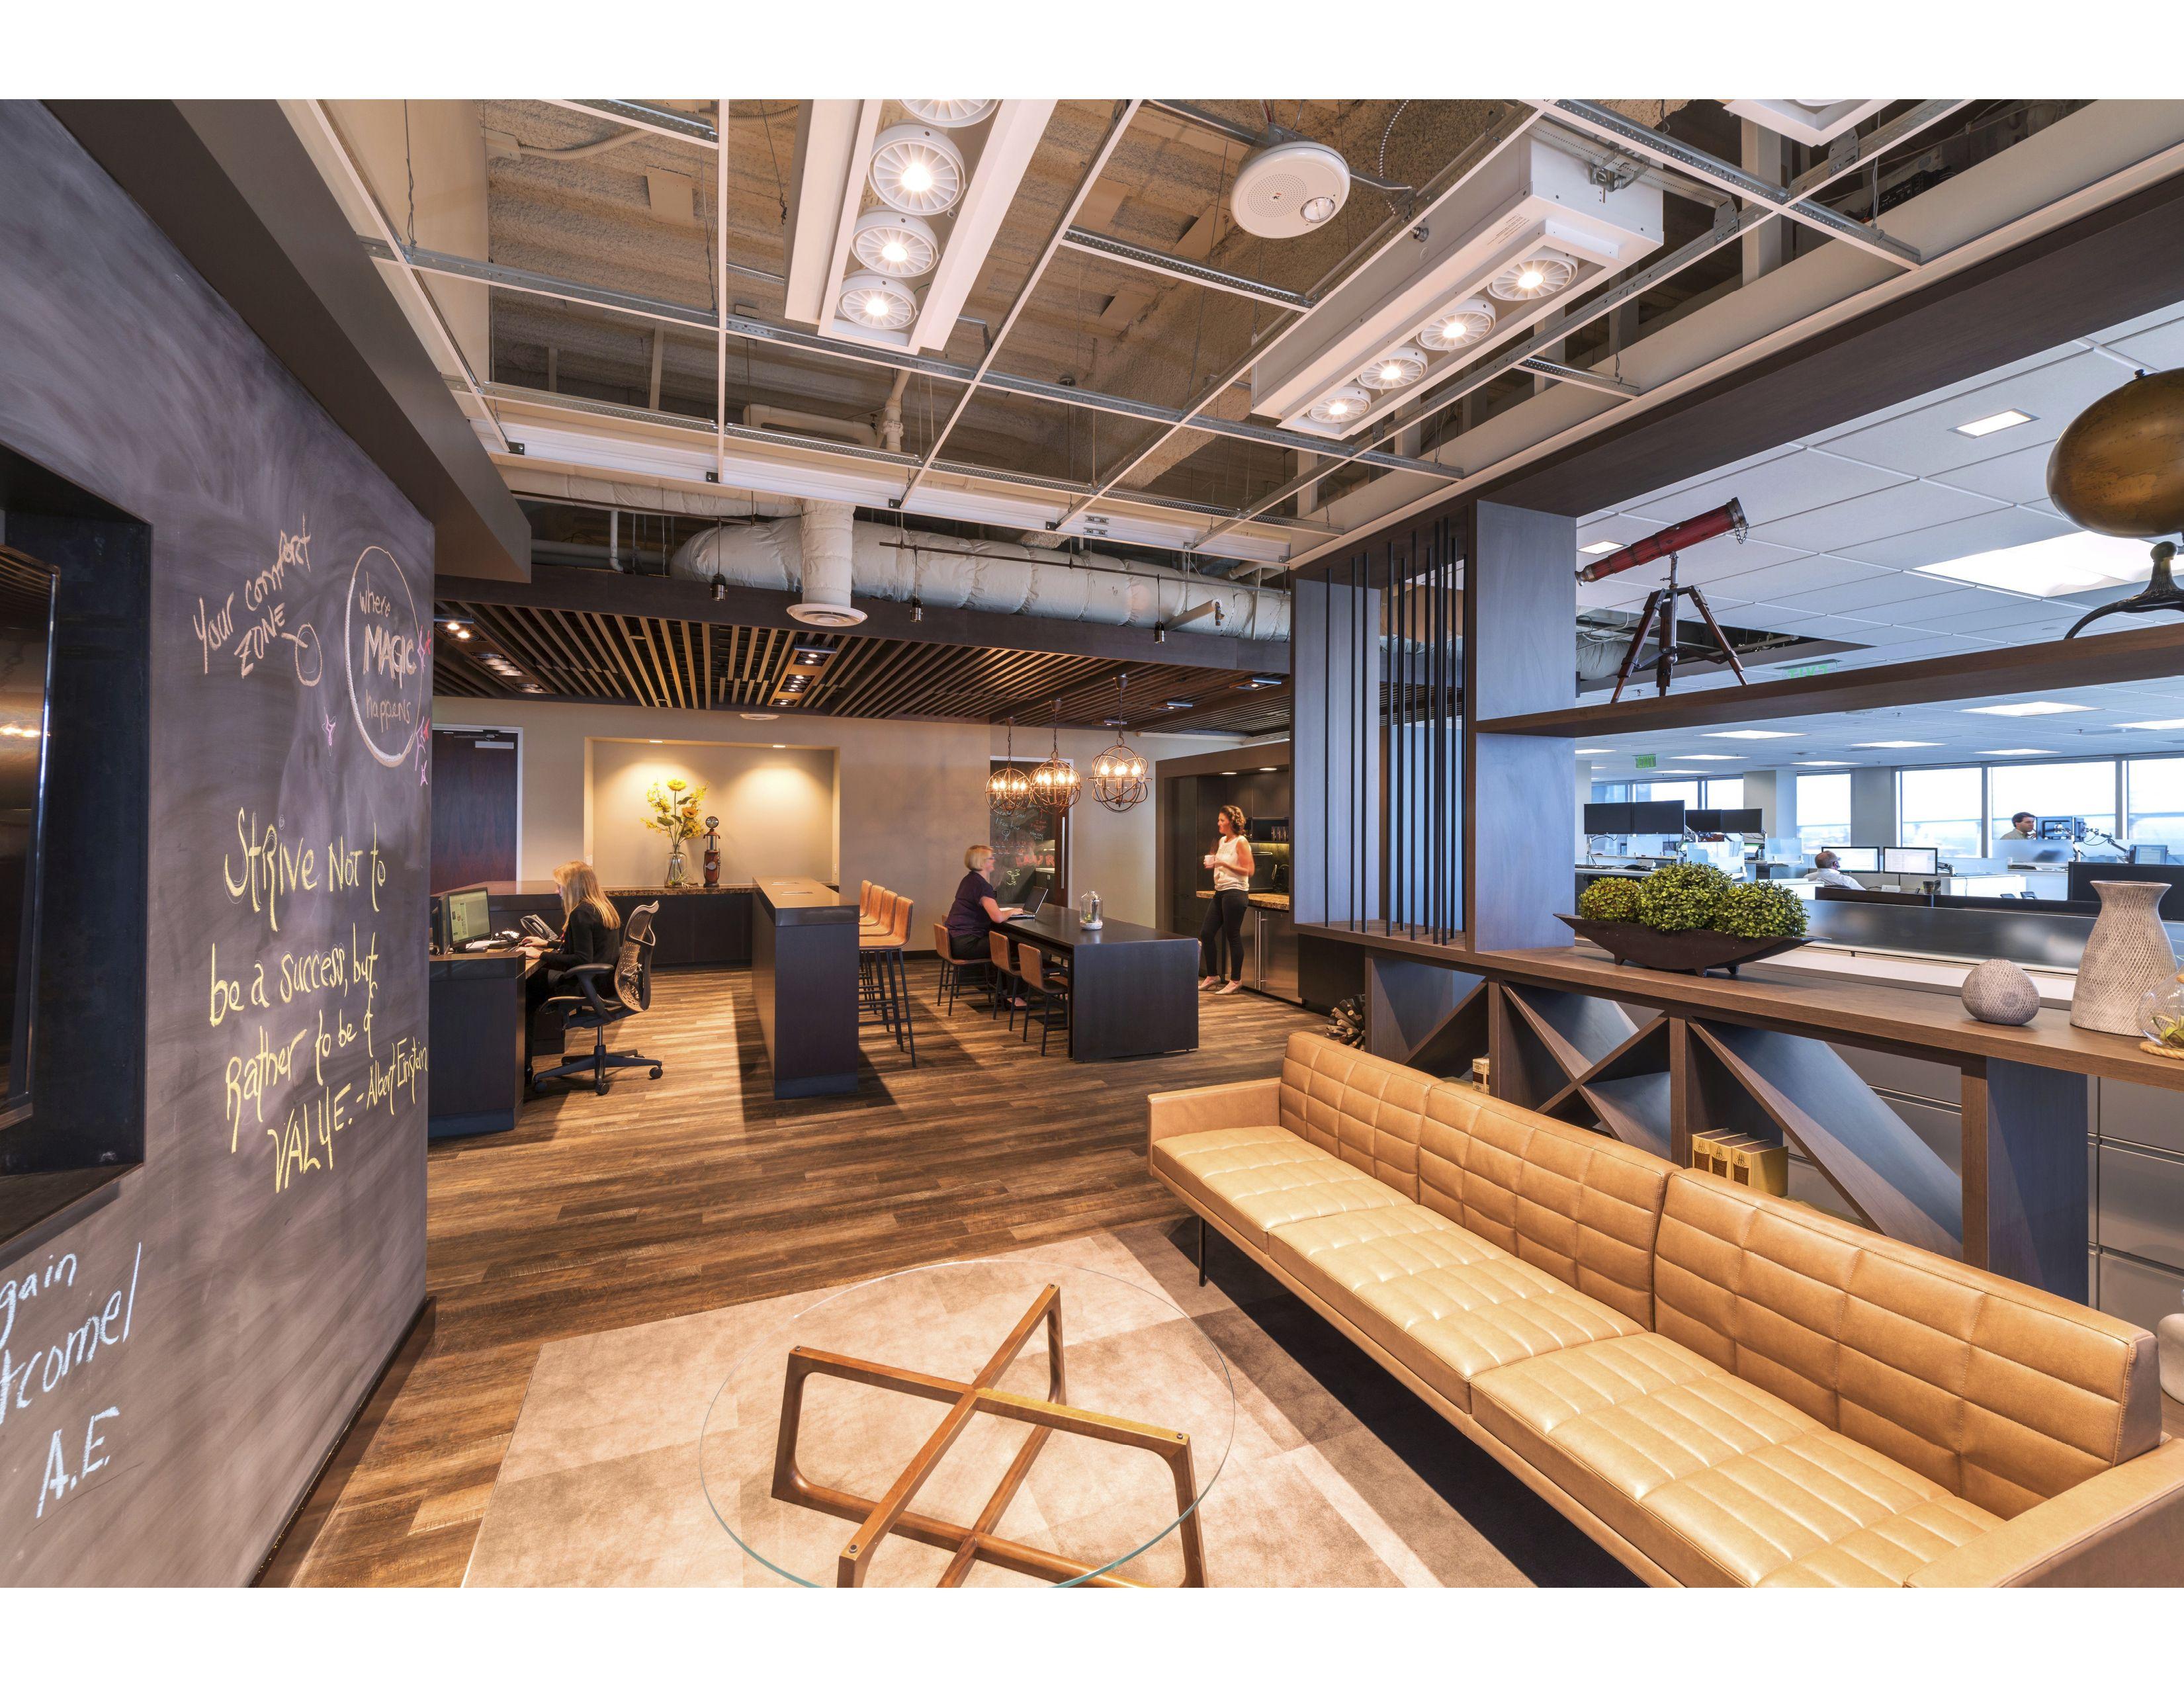 Cbre Downtown In San Diego Ca Smalloffice Commercialspaces Commercialinteriors Design Flooring Office Space Cool Office Space Cool Office